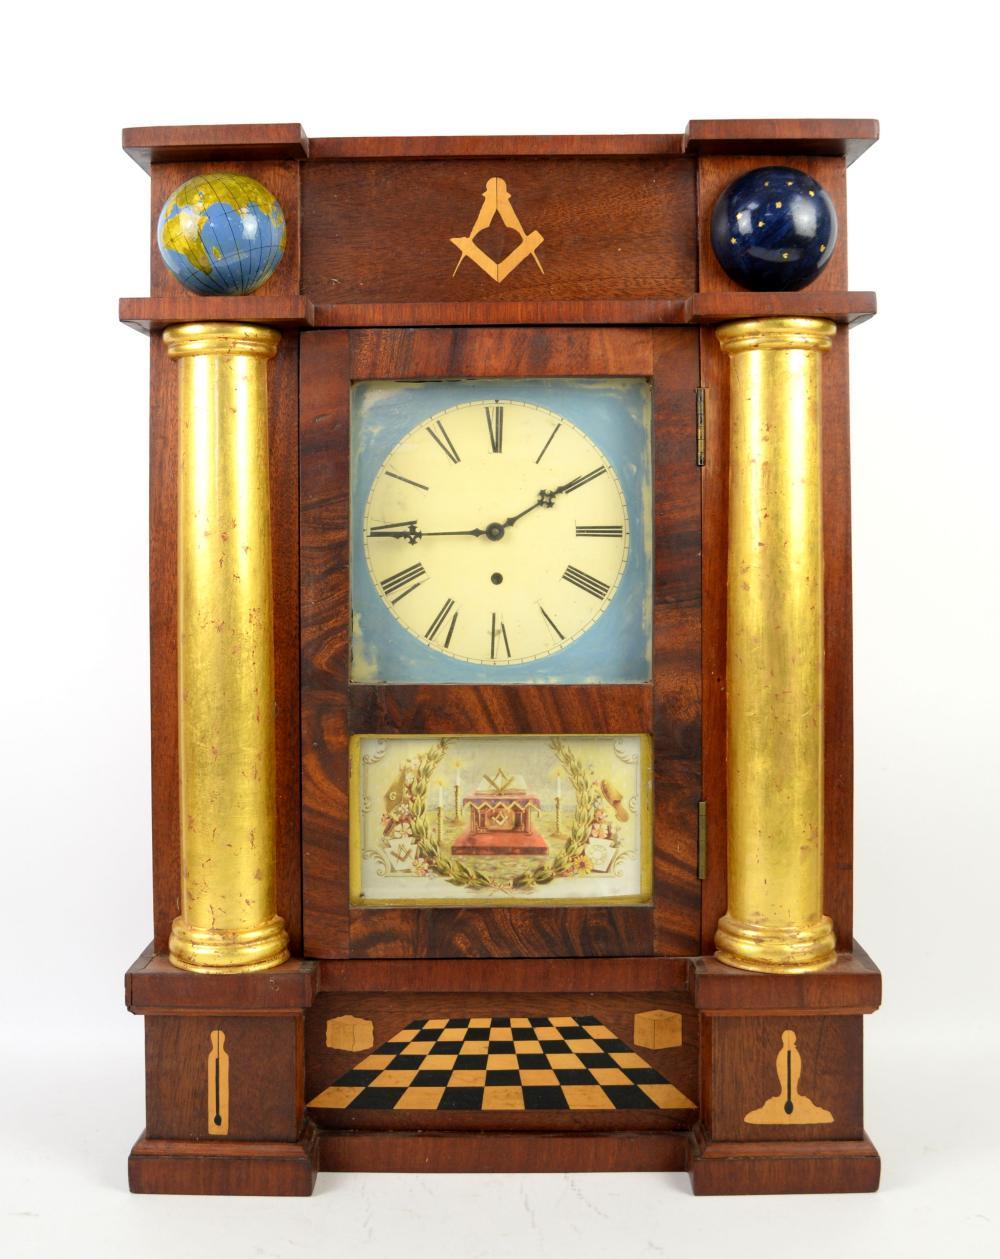 19th century American marquetry inlaid Masonic clo